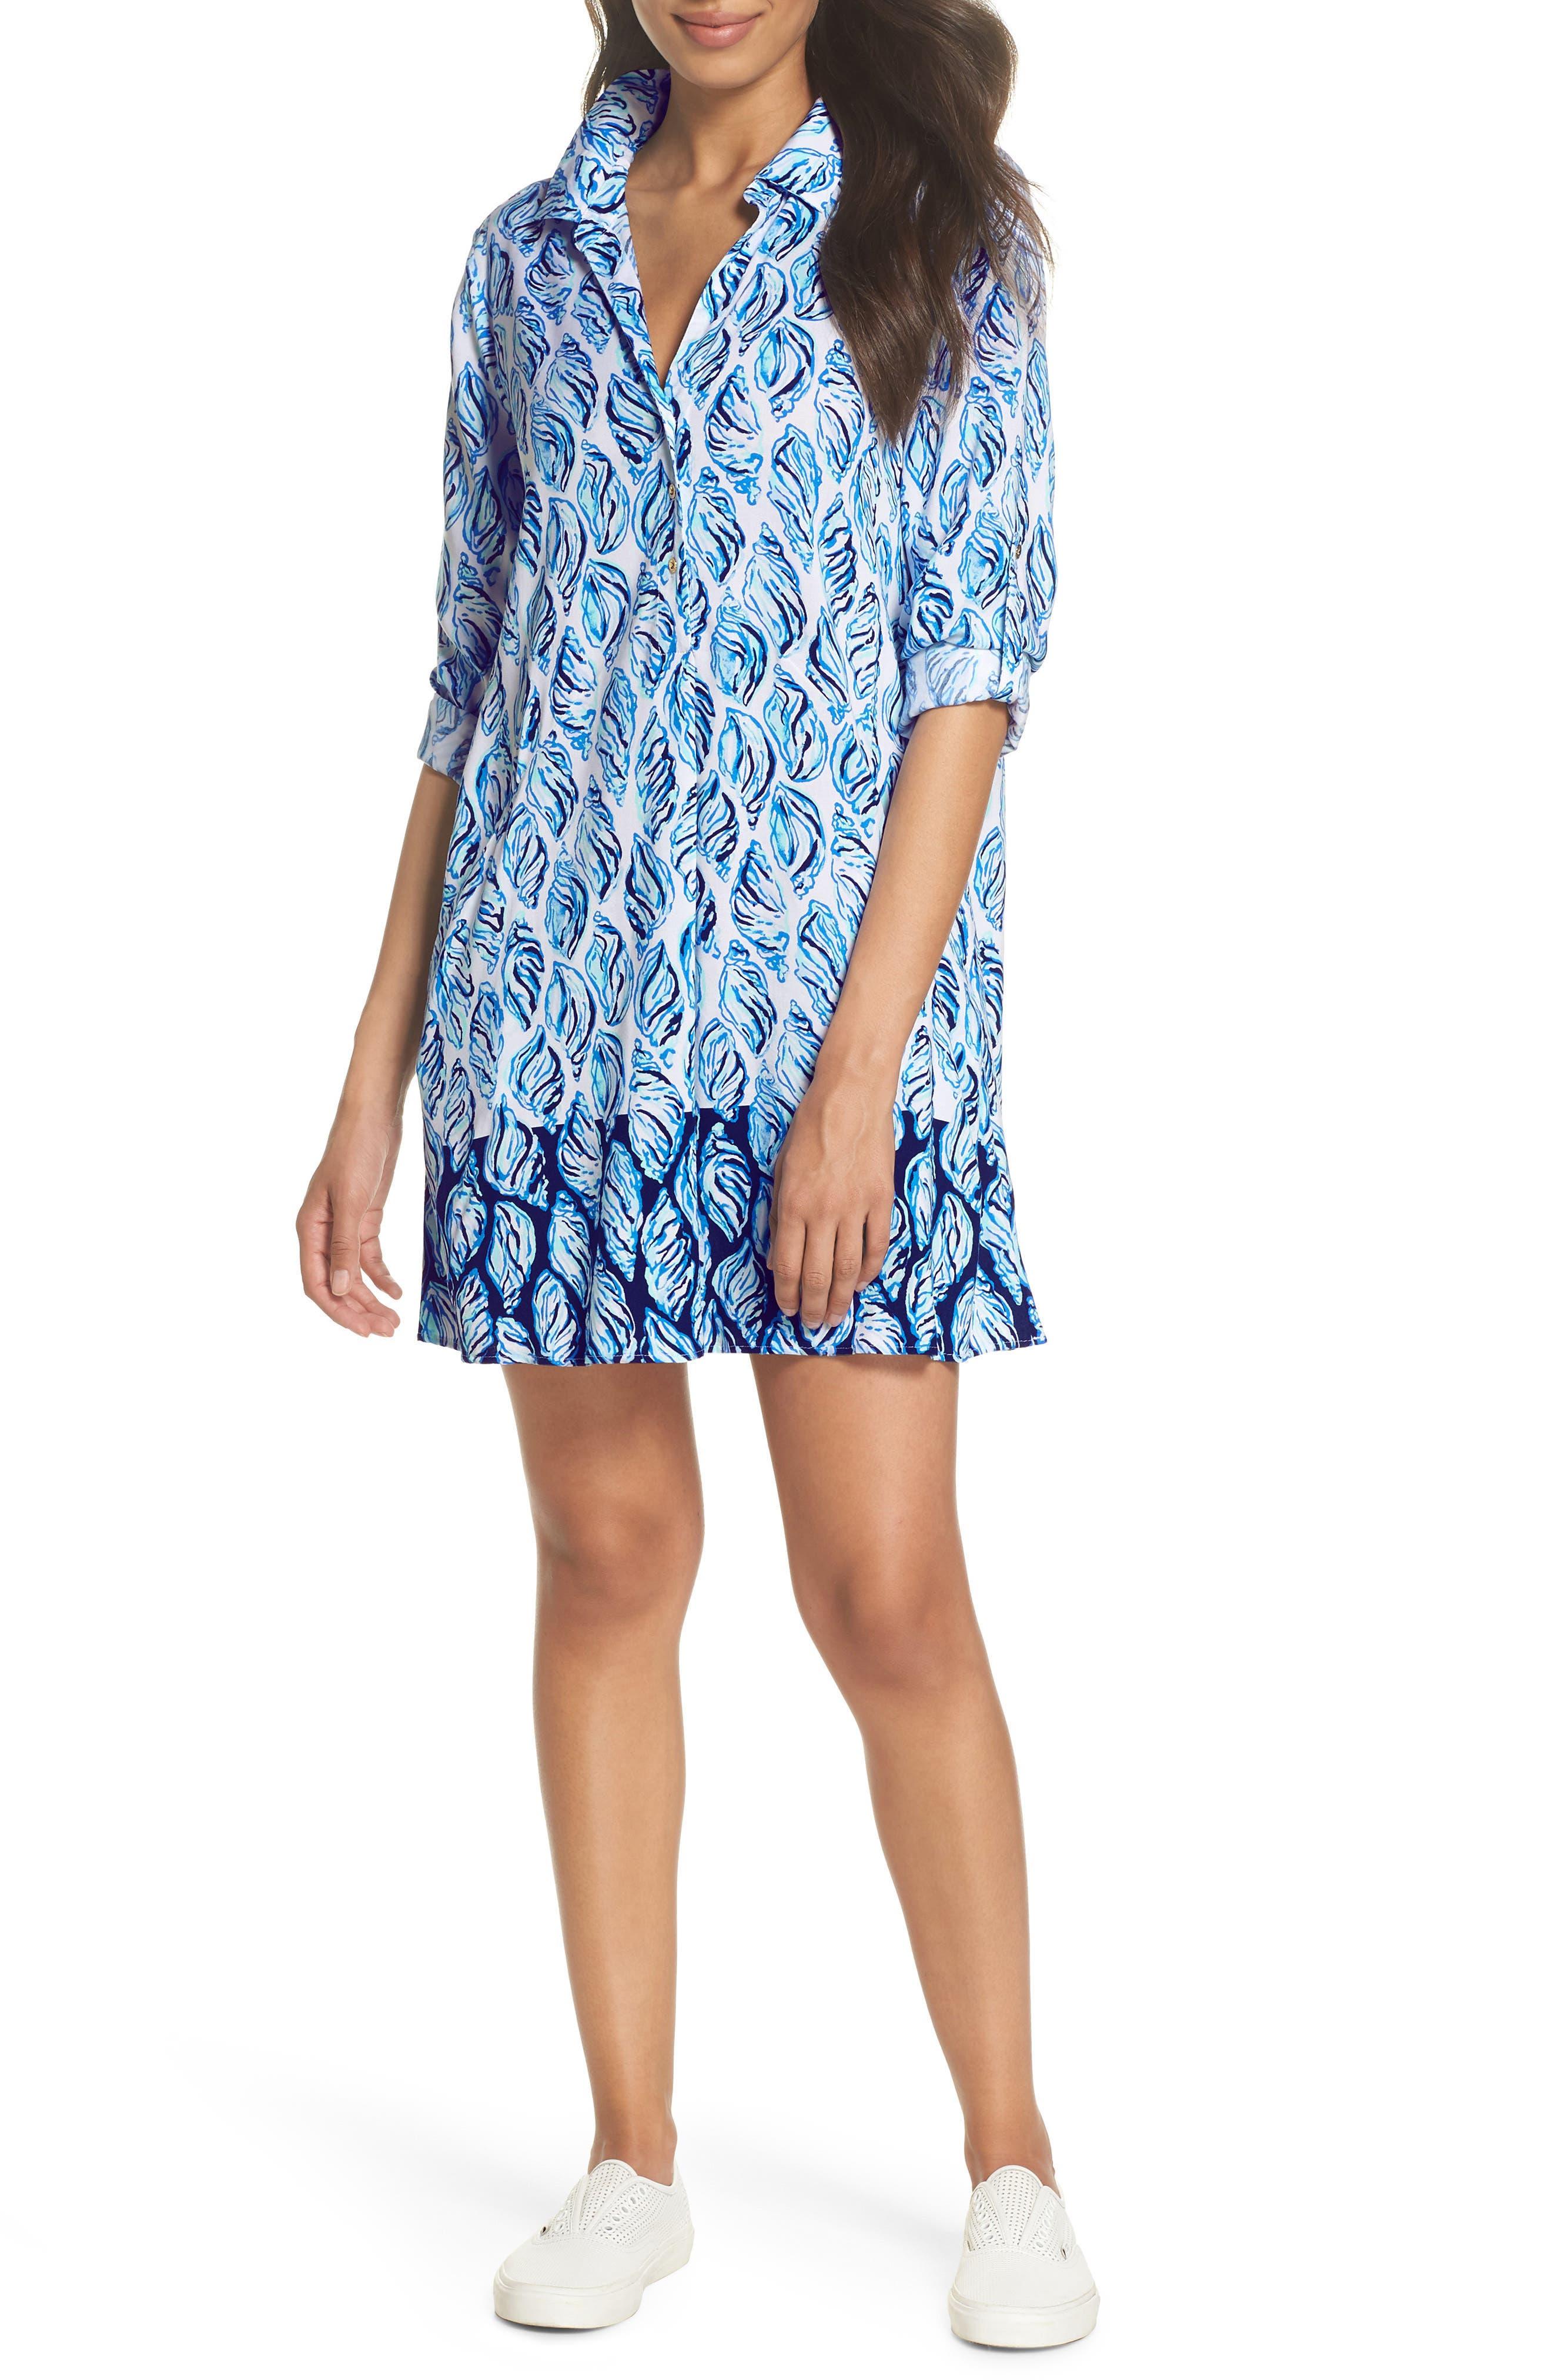 Lilly Pulitzer® Lillith Shirtdress